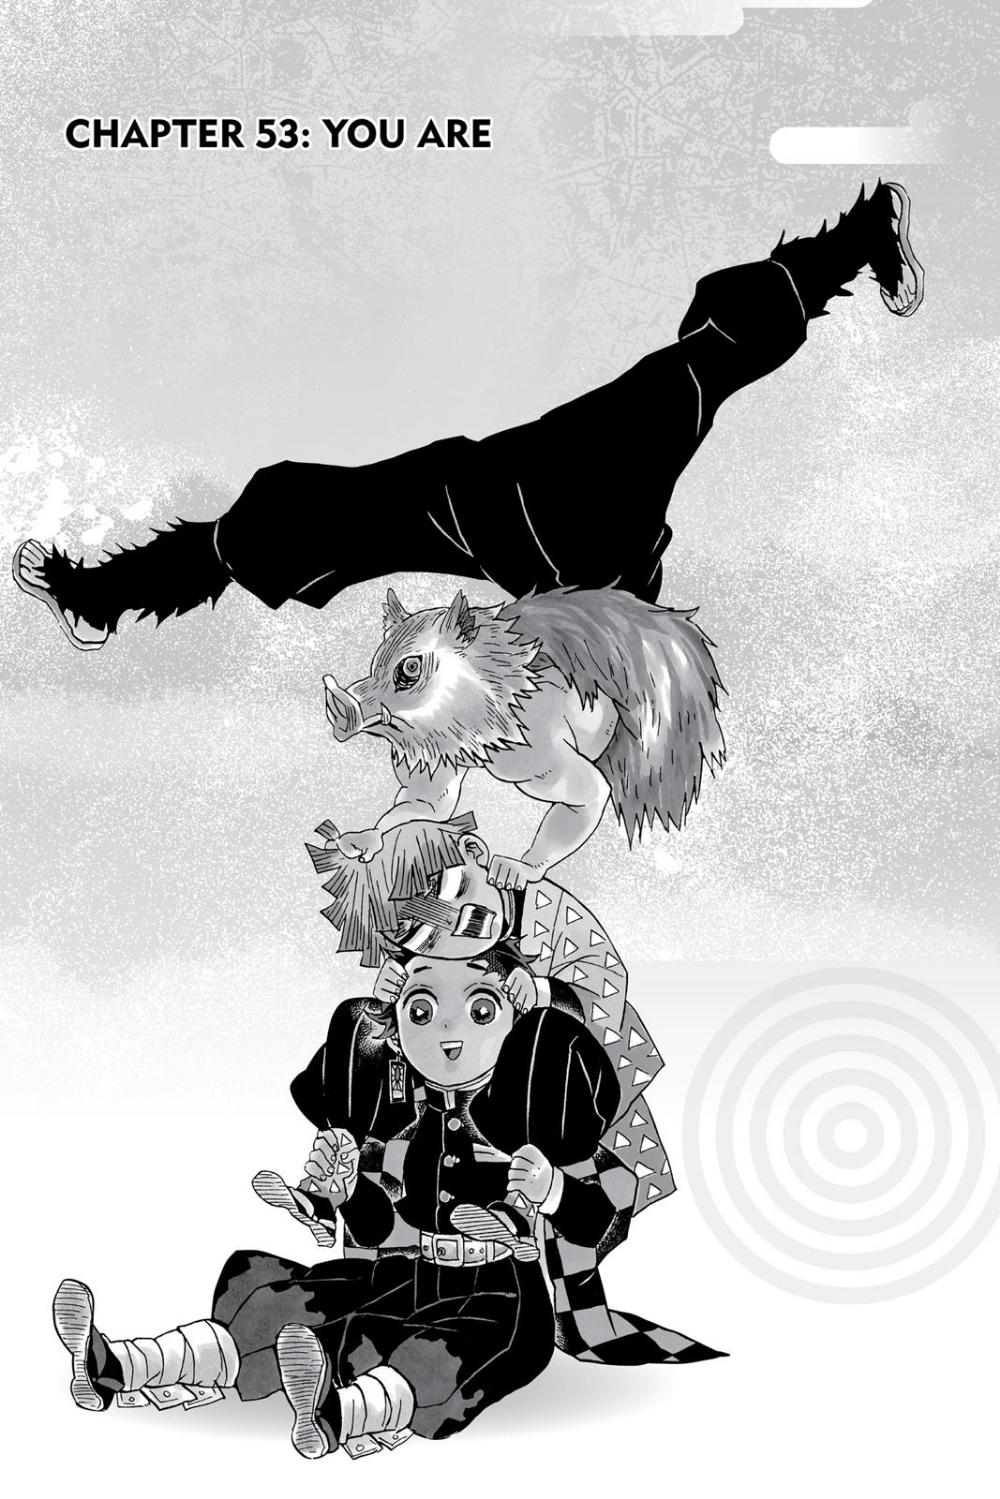 Demon Slayer Kimetsu No Yaiba Chapter 53 Slayer Slayer Anime Anime